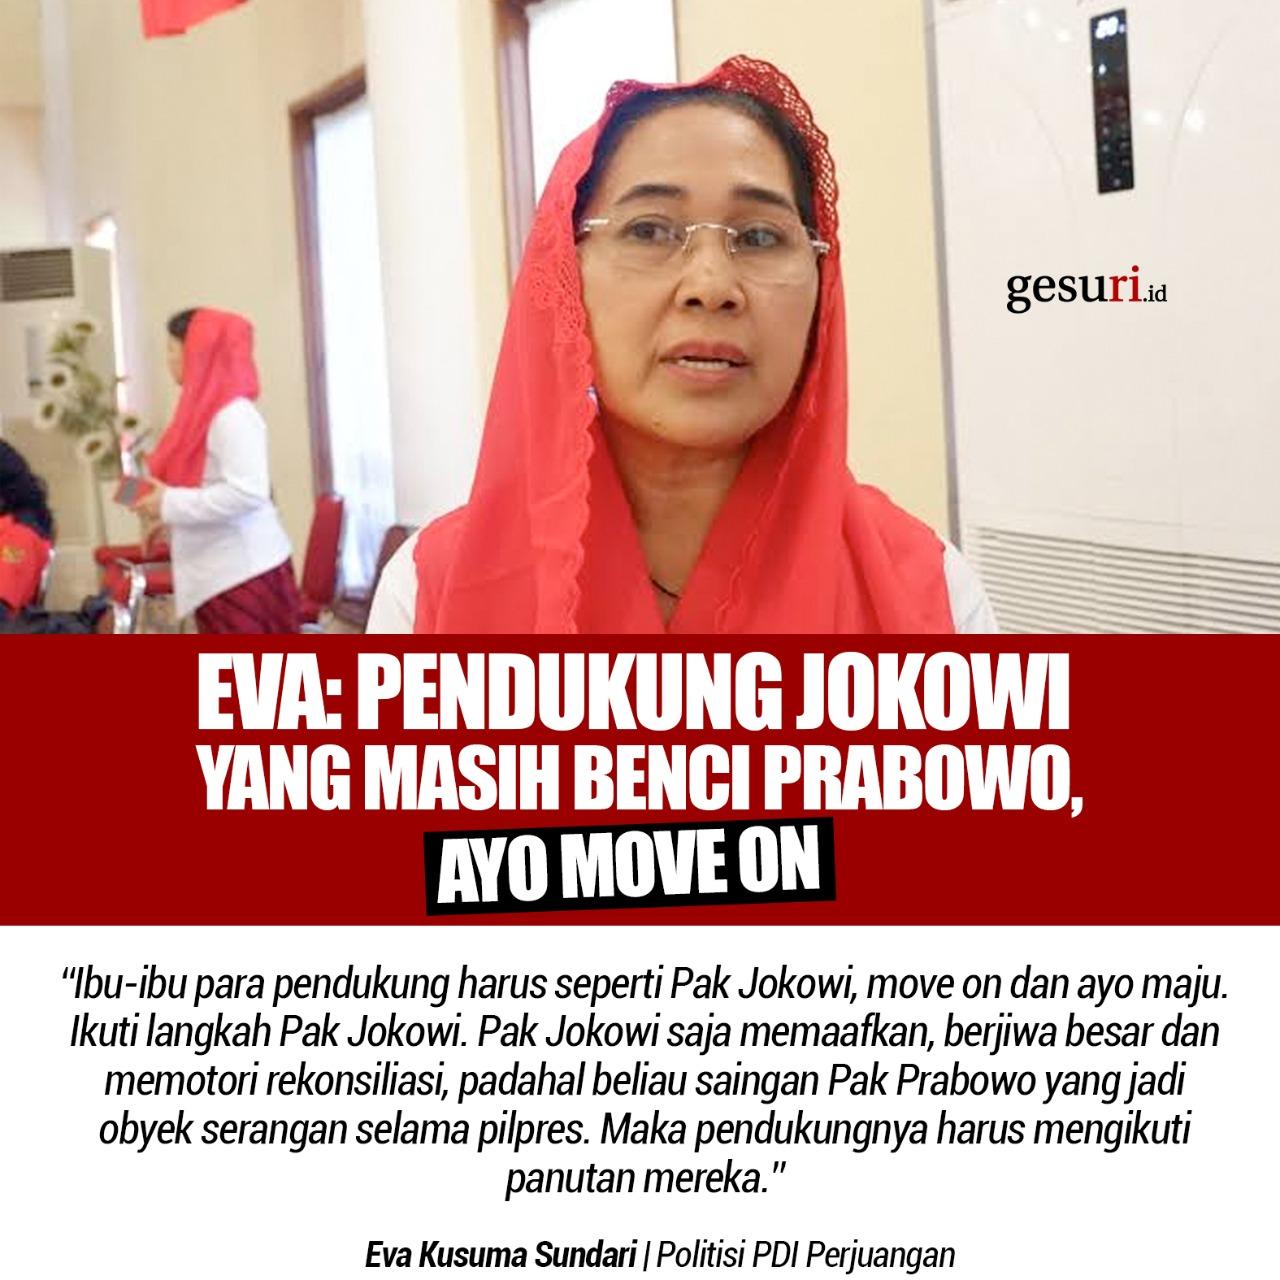 Eva: Pendukung Prabowo yang Masih Benci Jokowi, Ayo Move On